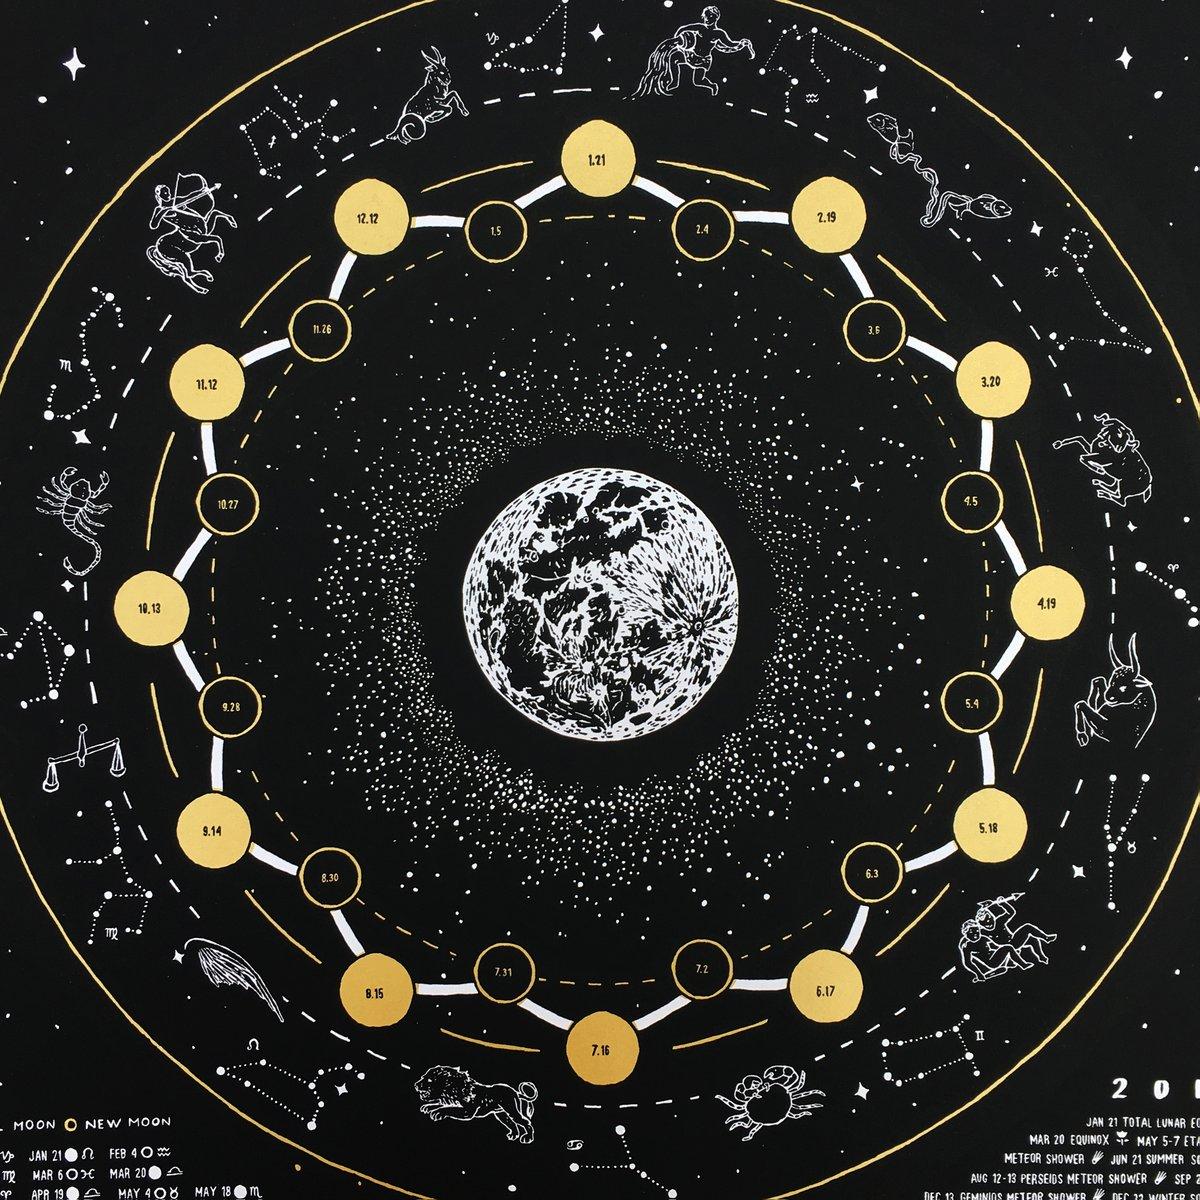 Image of 2019 lunar calendar / 2019 misprints